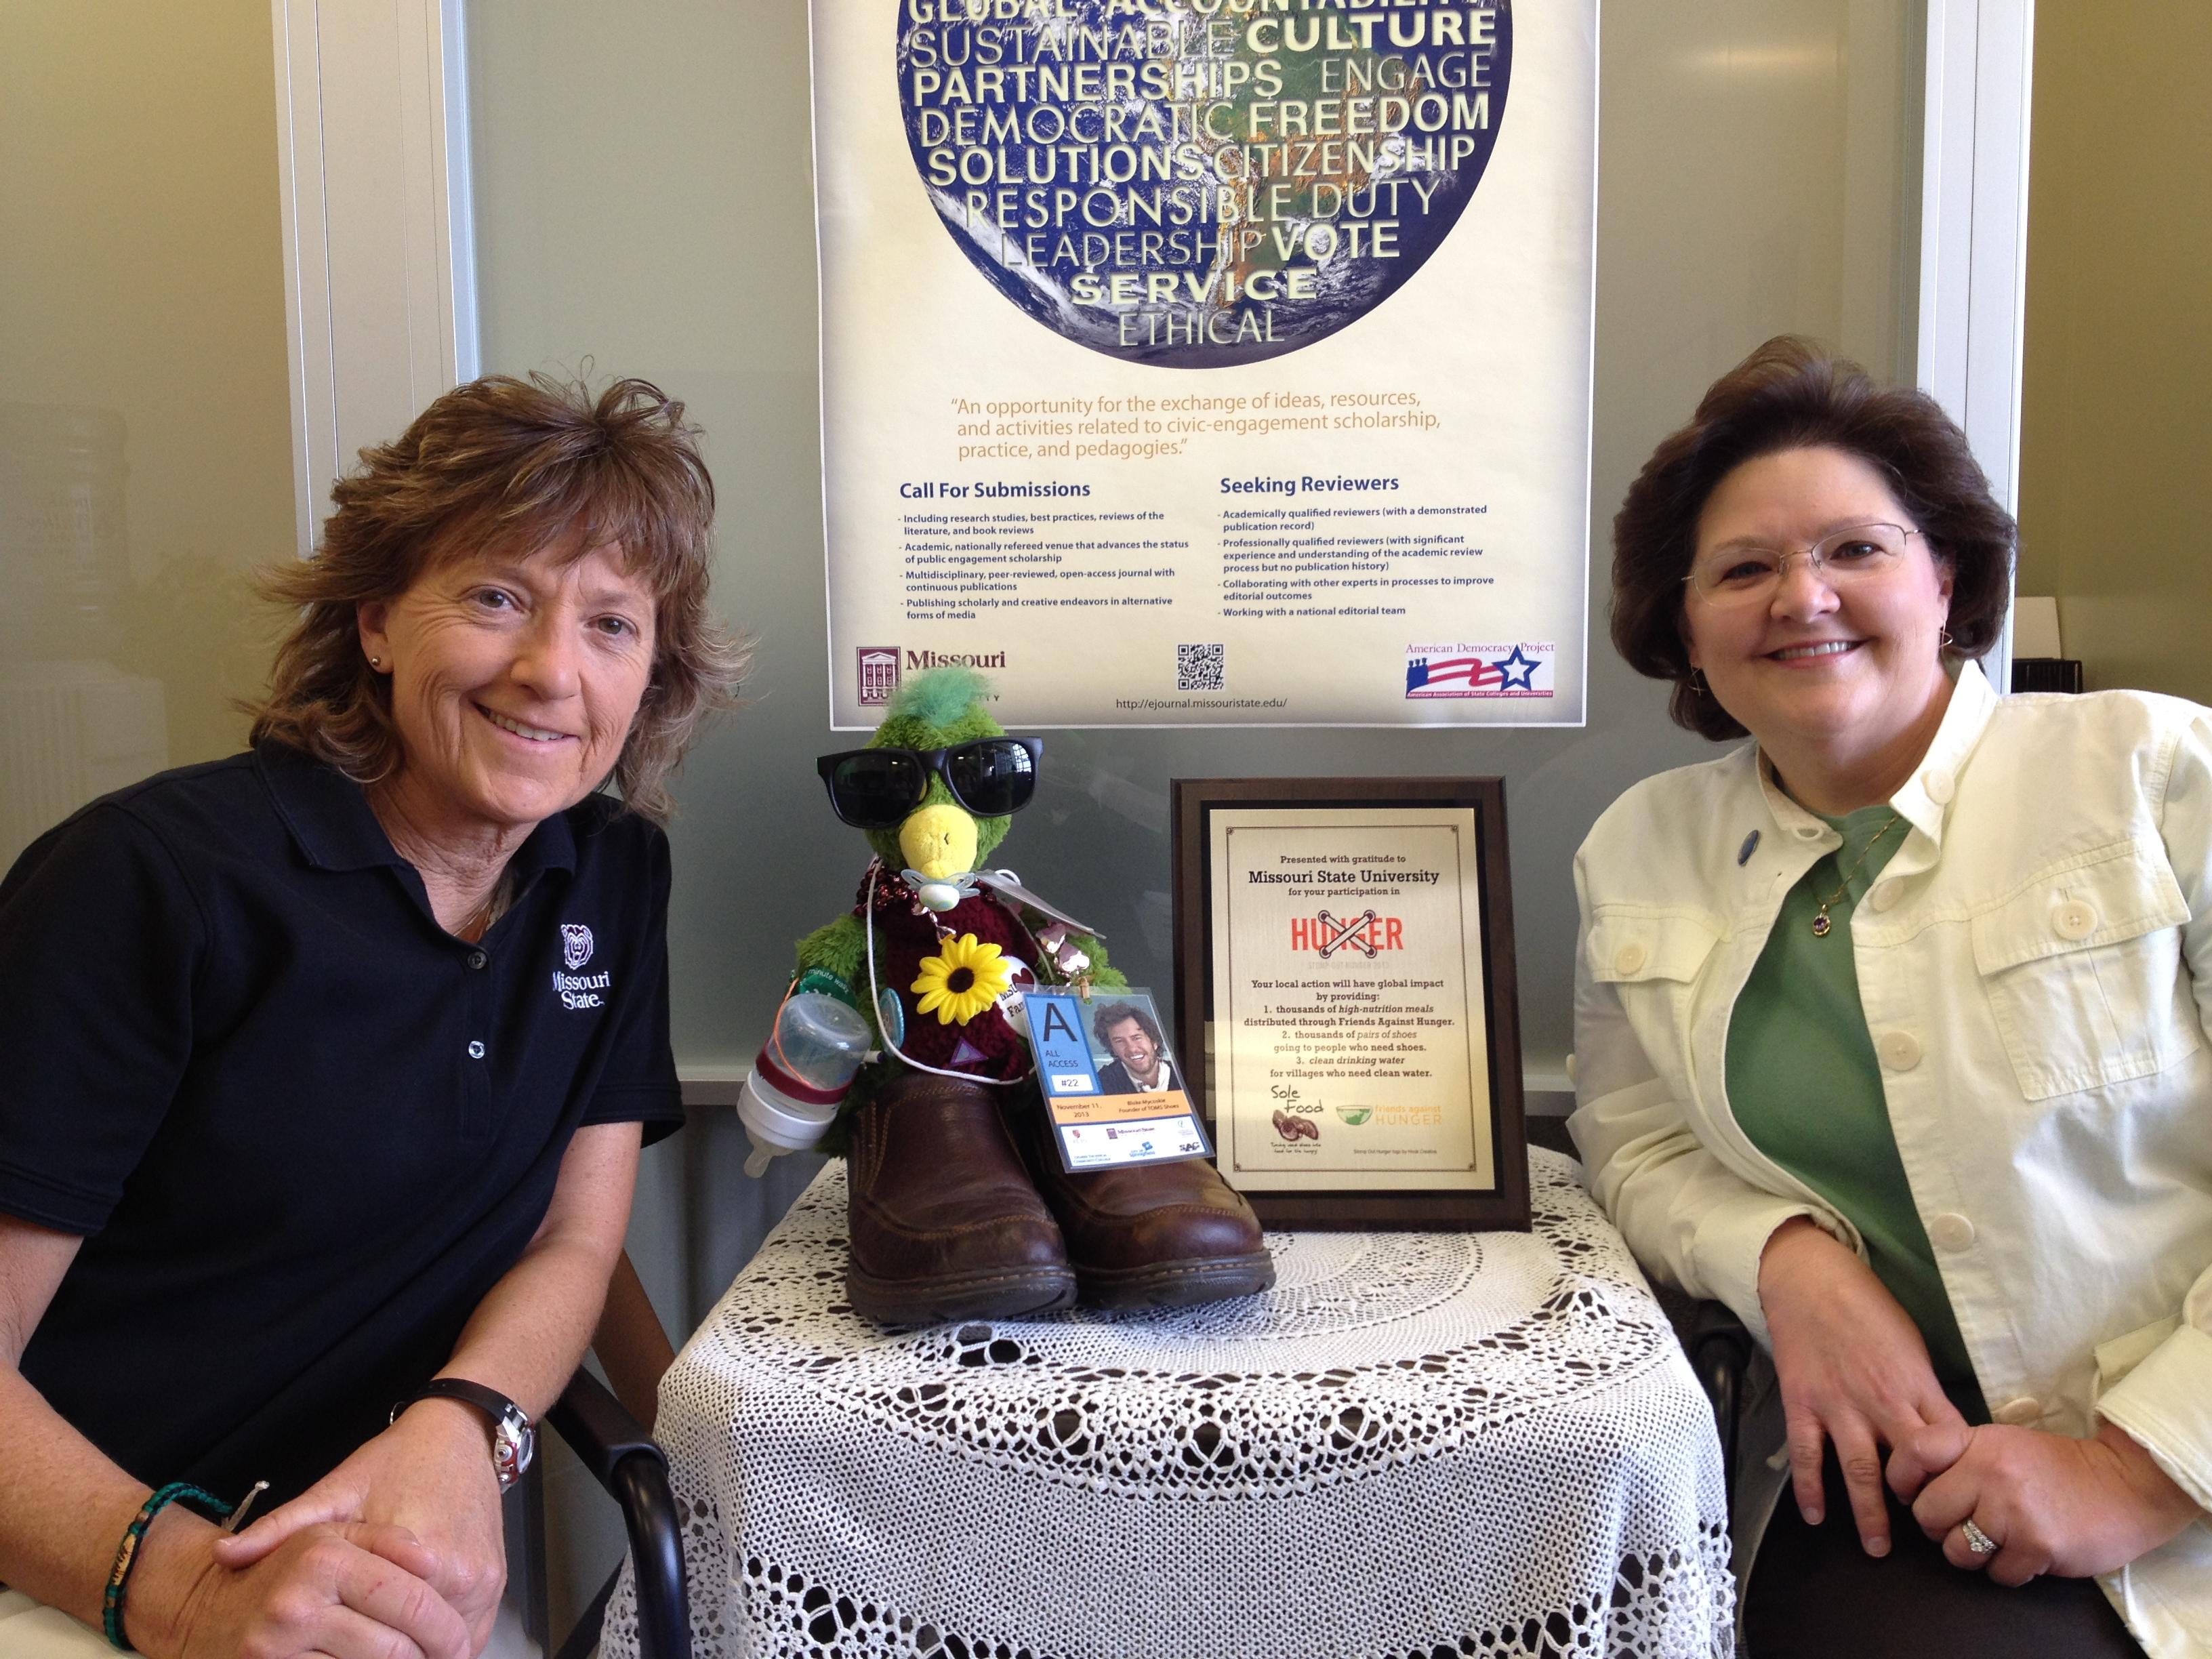 Lora Hobbs and Mary Ann Wood Win Huey Award